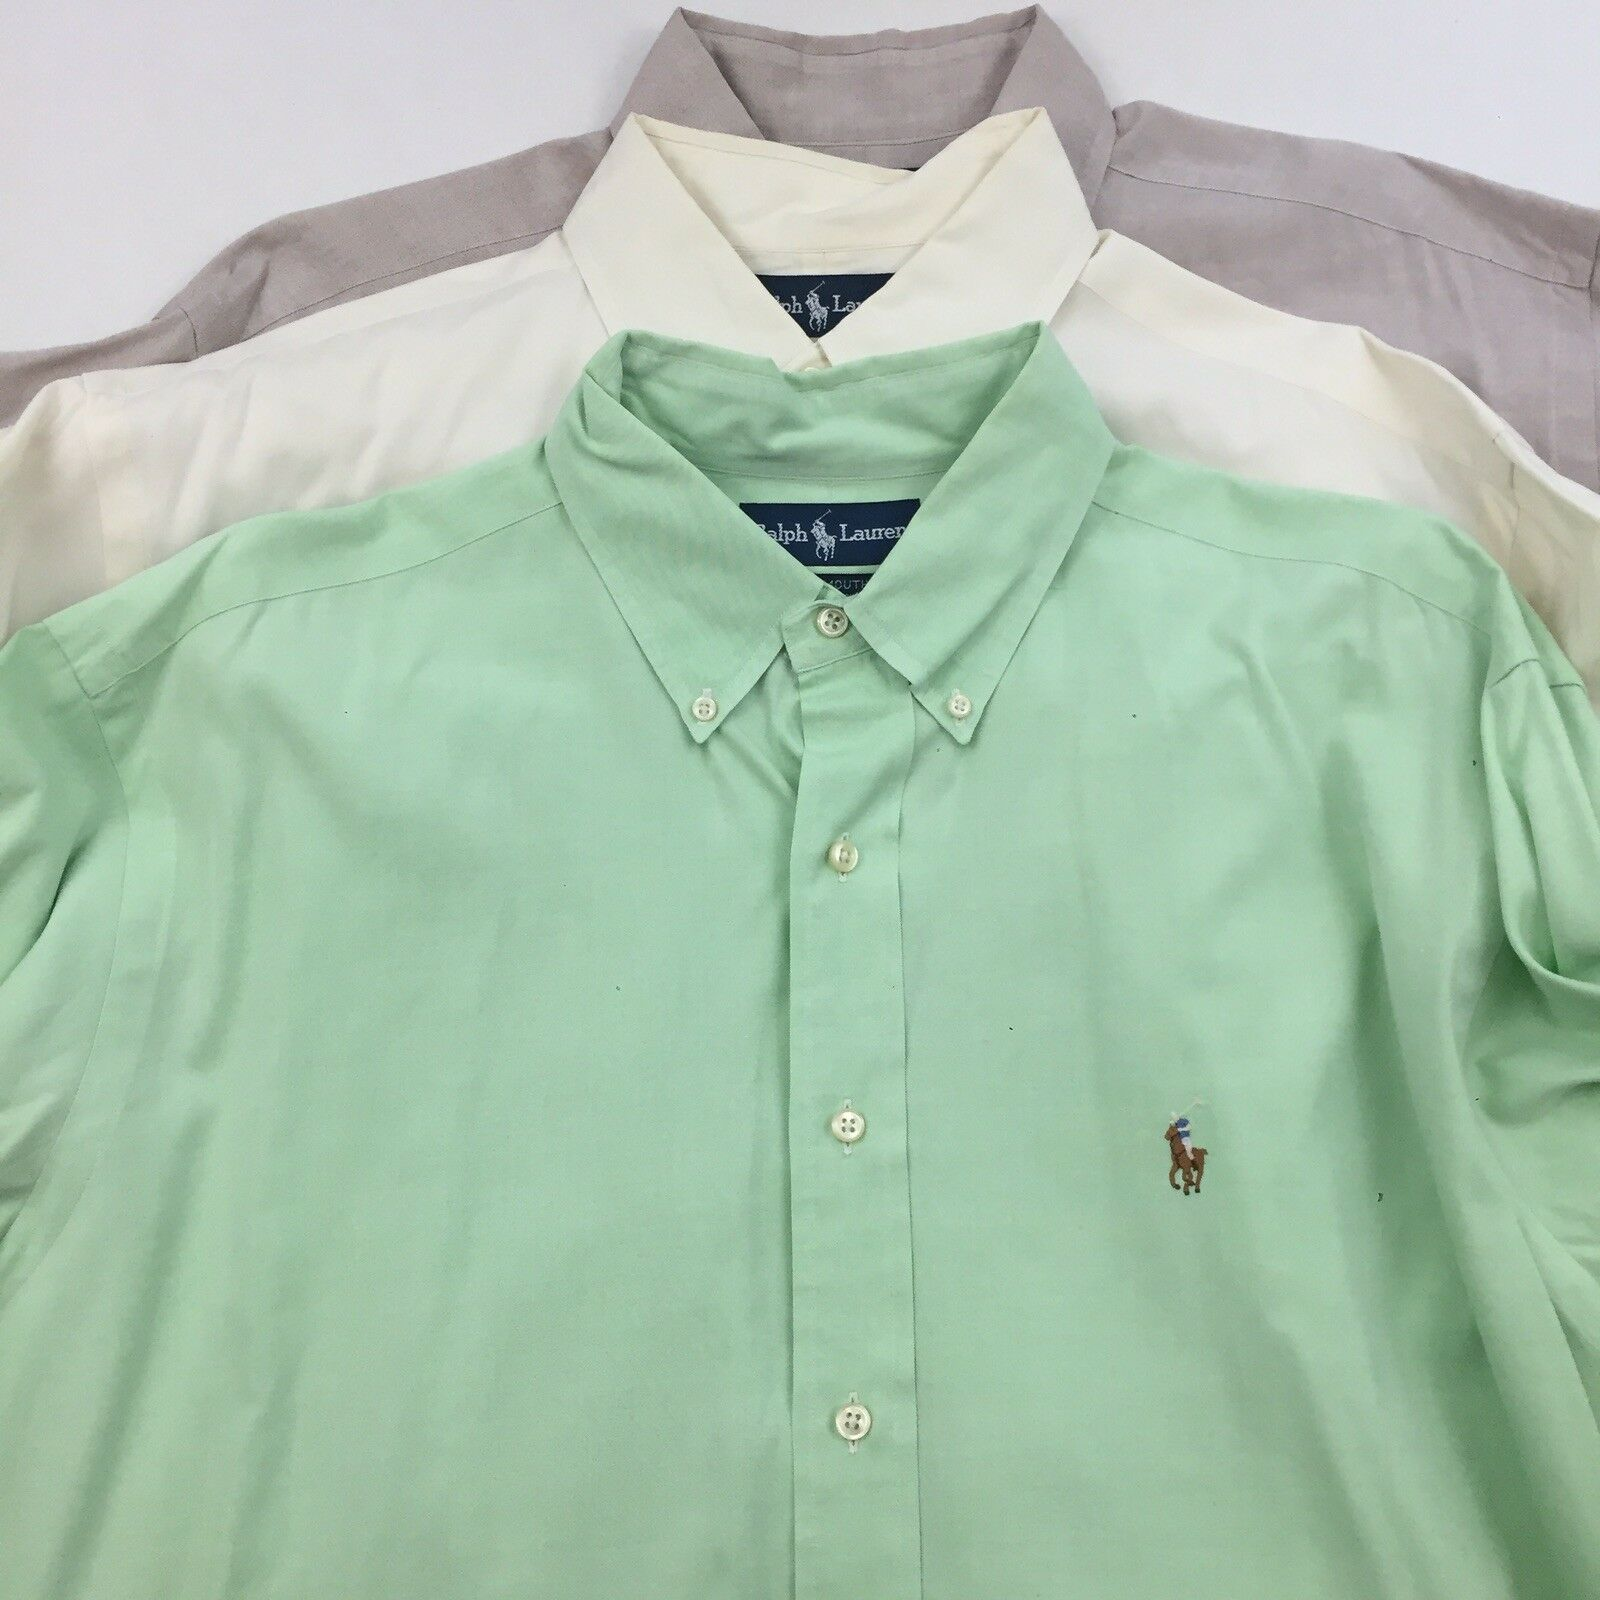 Lot of 3 RALPH LAUREN Yarmouth 16 1/2 Pony Large Dress Shirt Long Sleeve Oxford